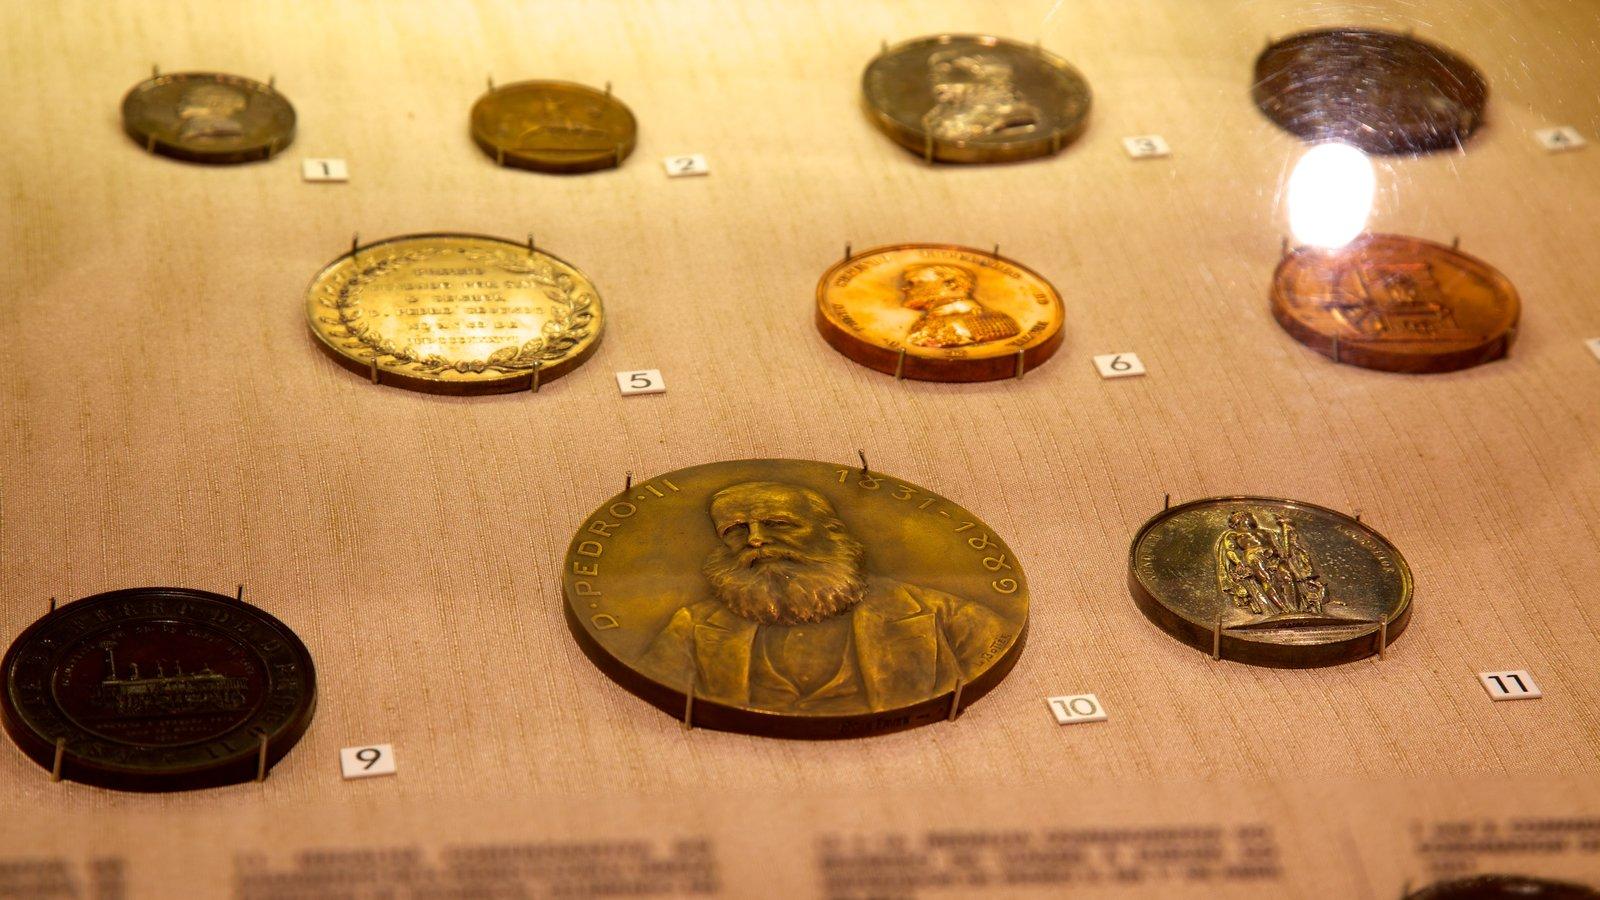 Museu Histórico Nacional caracterizando vistas internas